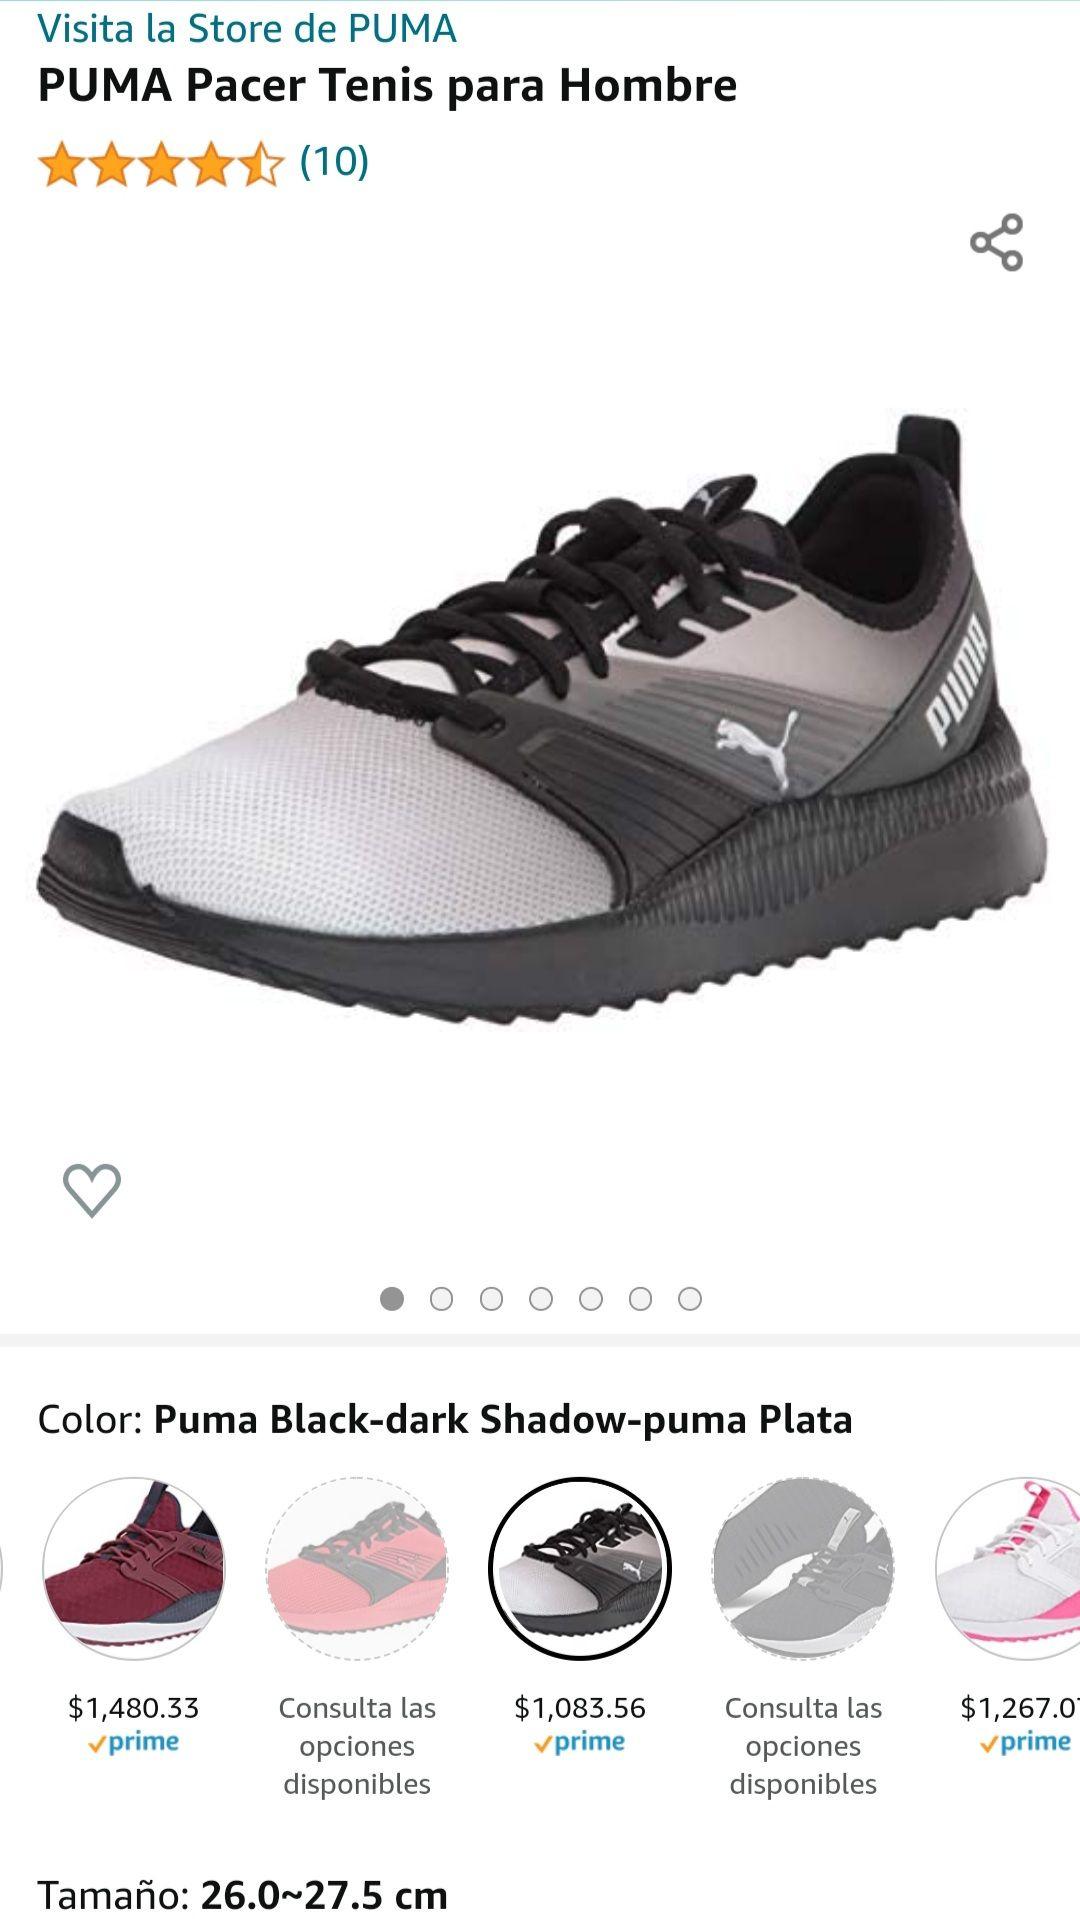 Amazon, Tennis Puma